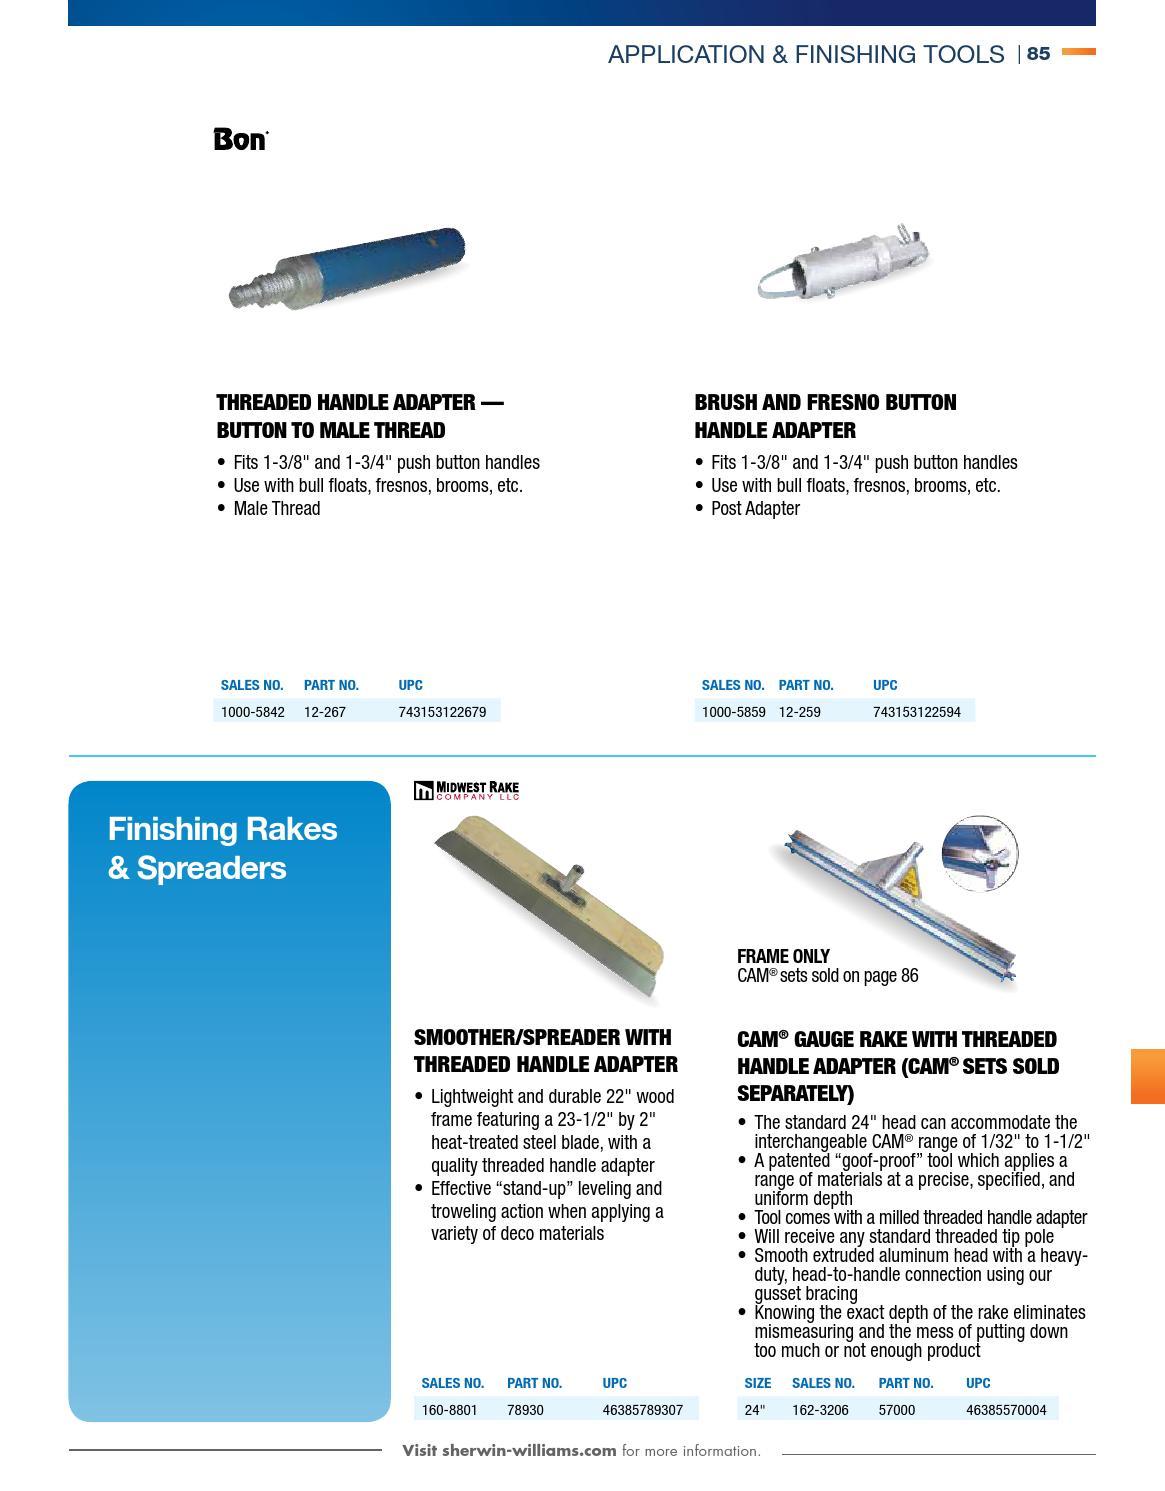 Bon 12-259 Aluminum Brush and Fresno Handle Adapter